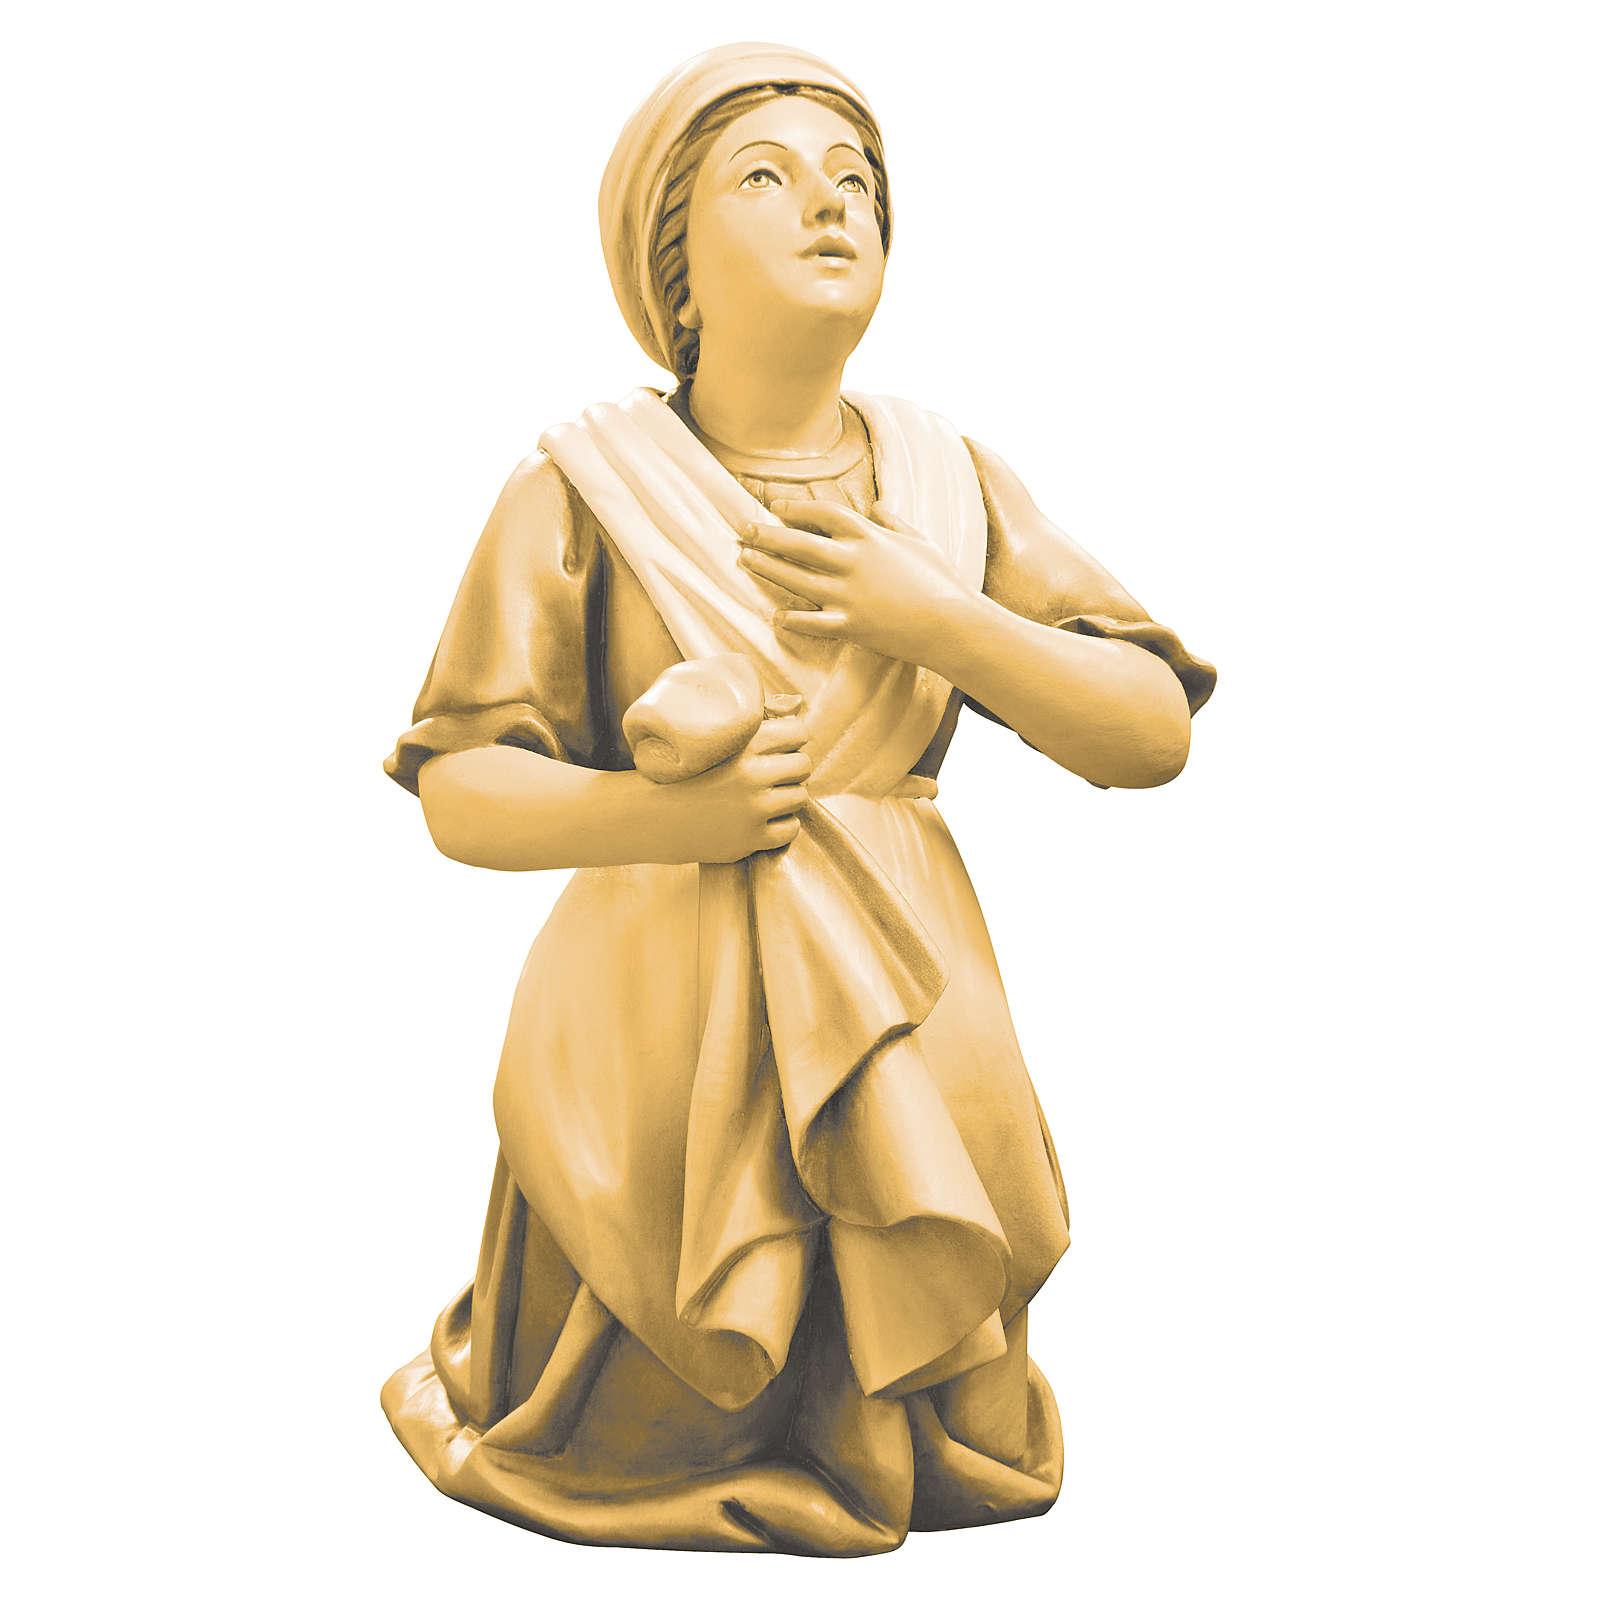 Estatua Bernadette de madera de arce, acabado con diferentes matices de marrón 4